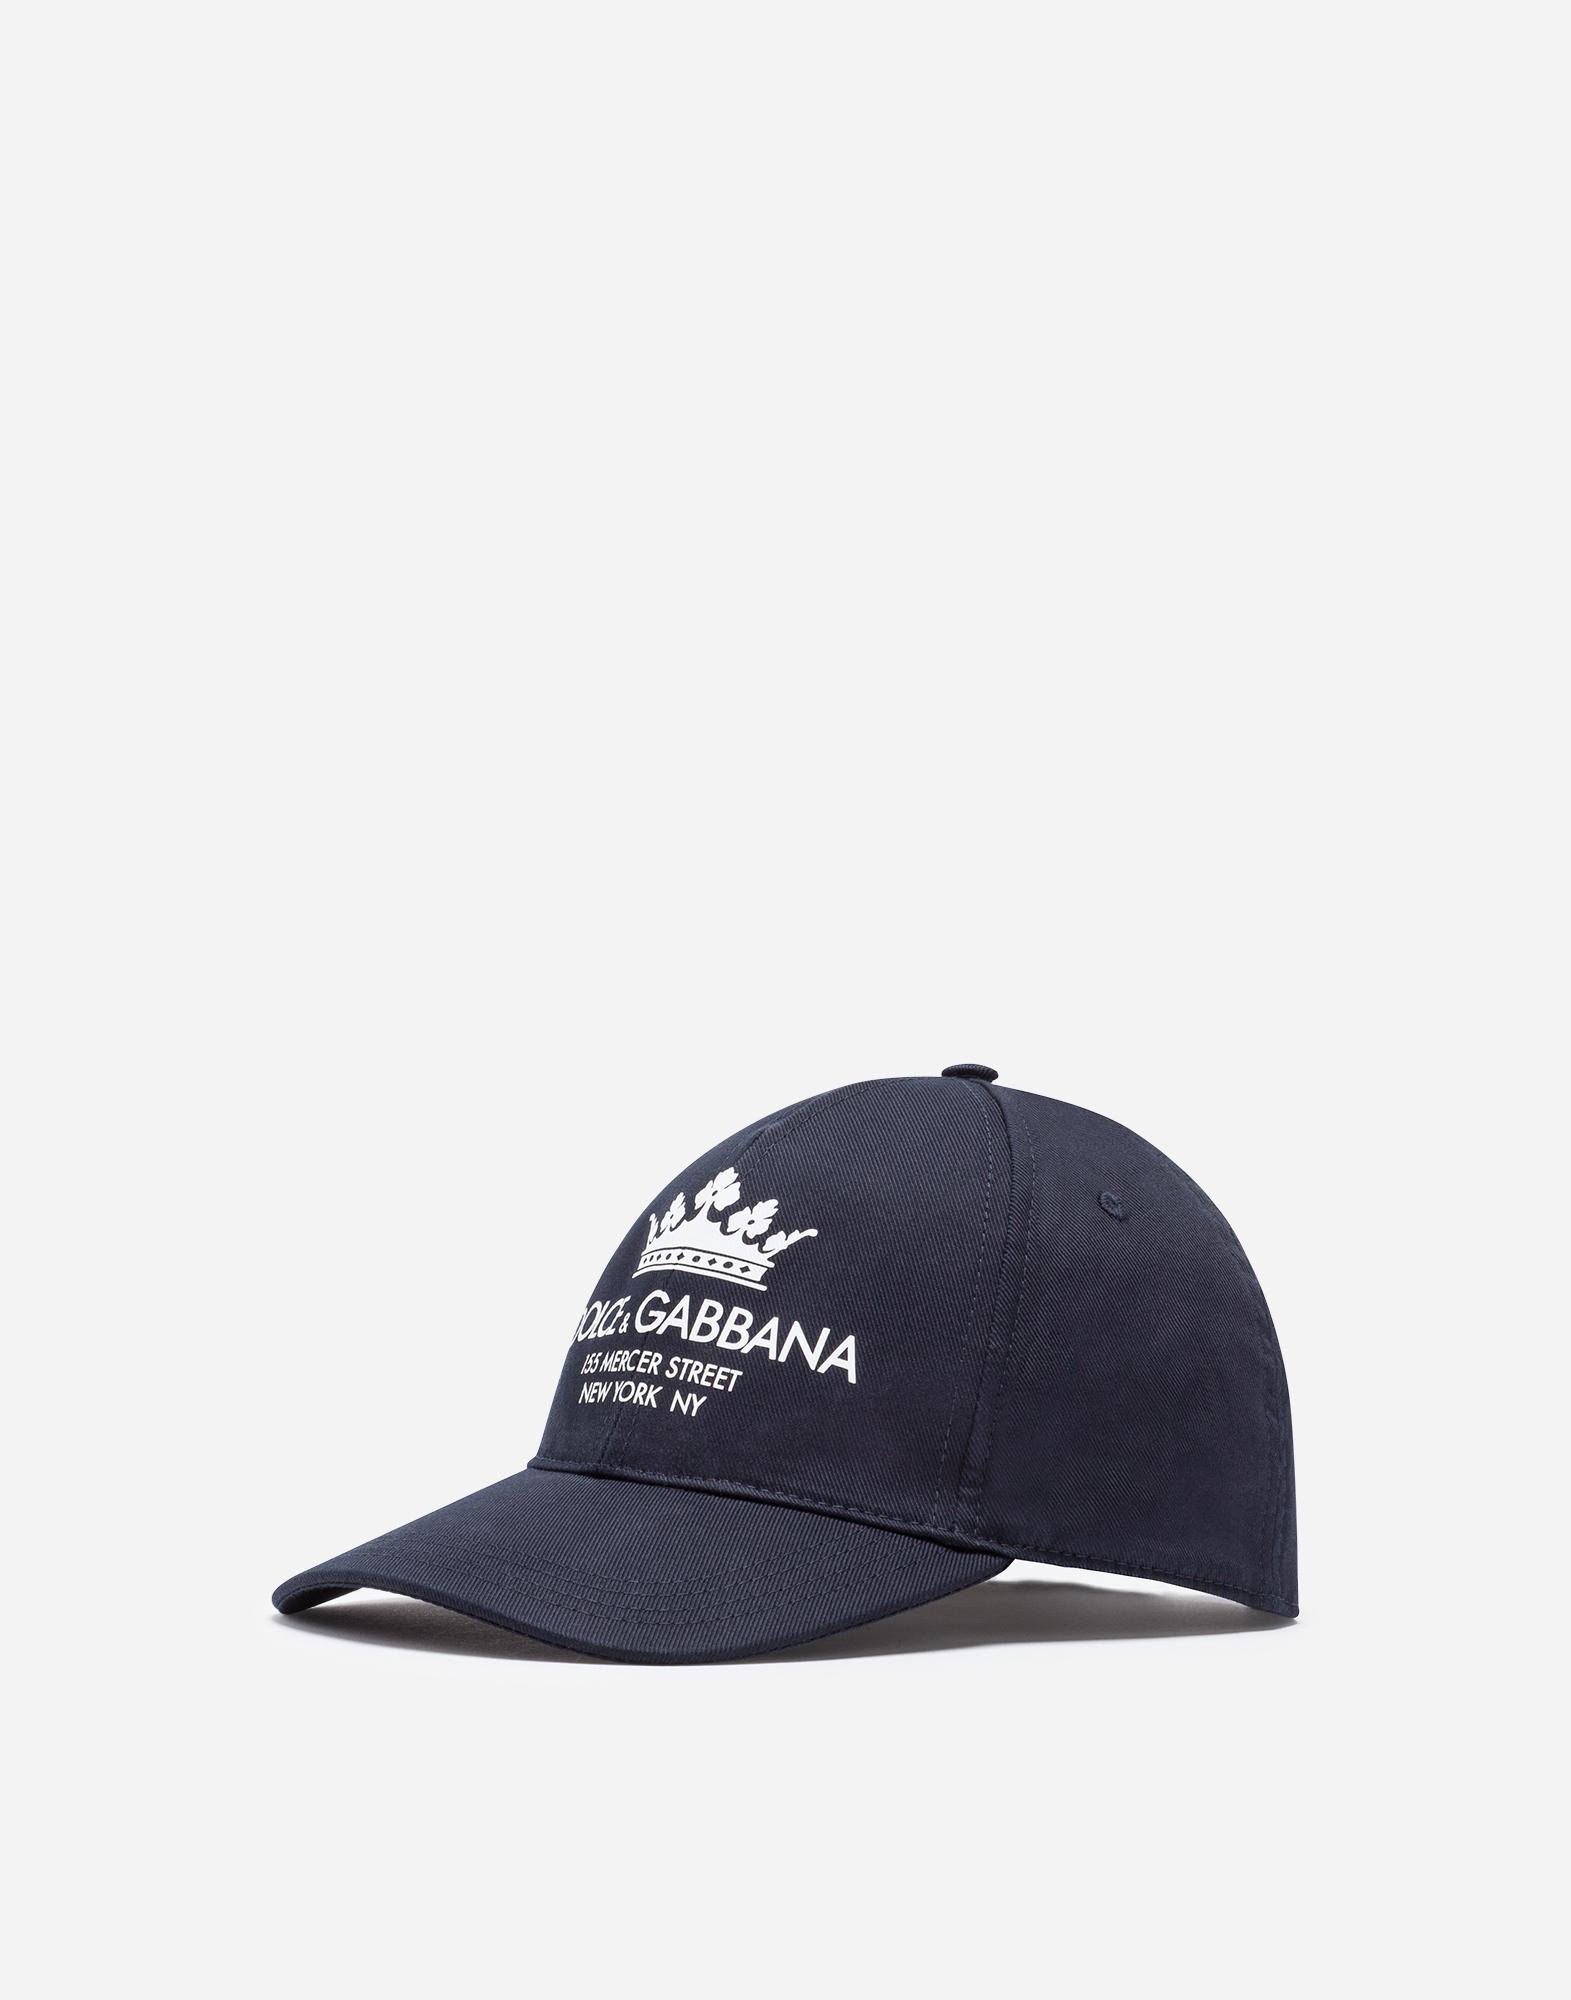 BASEBALL CAP IN PRINTED STRETCH COTTON